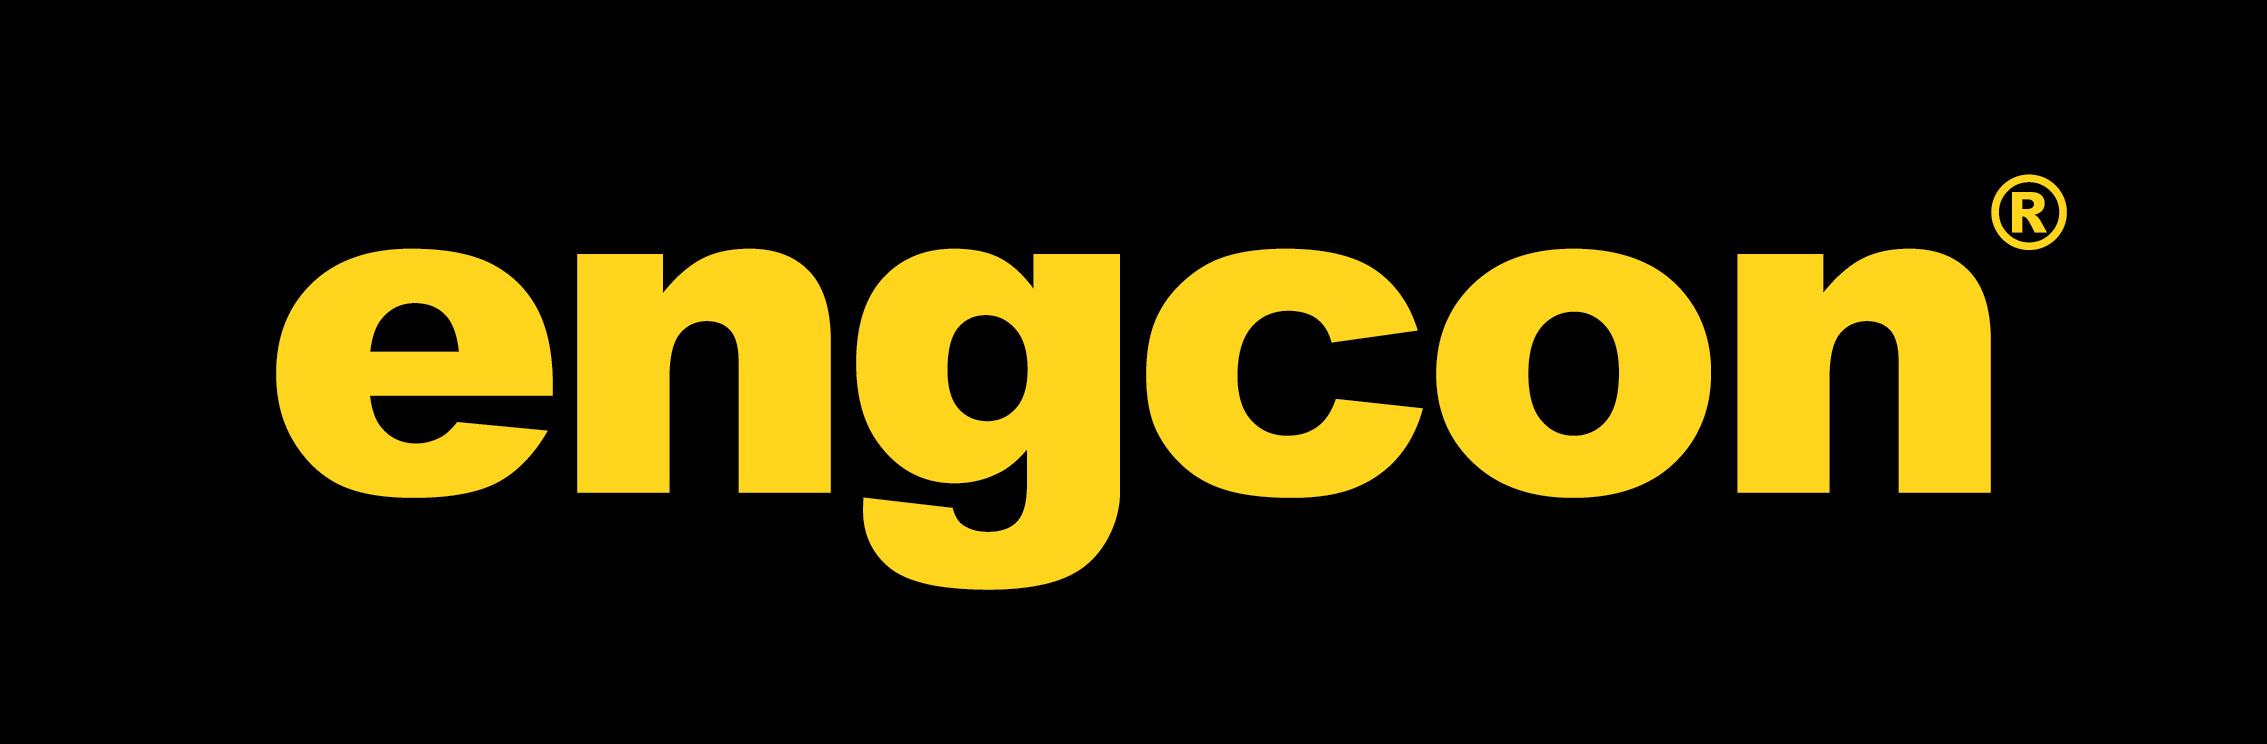 Logotyper Engcon